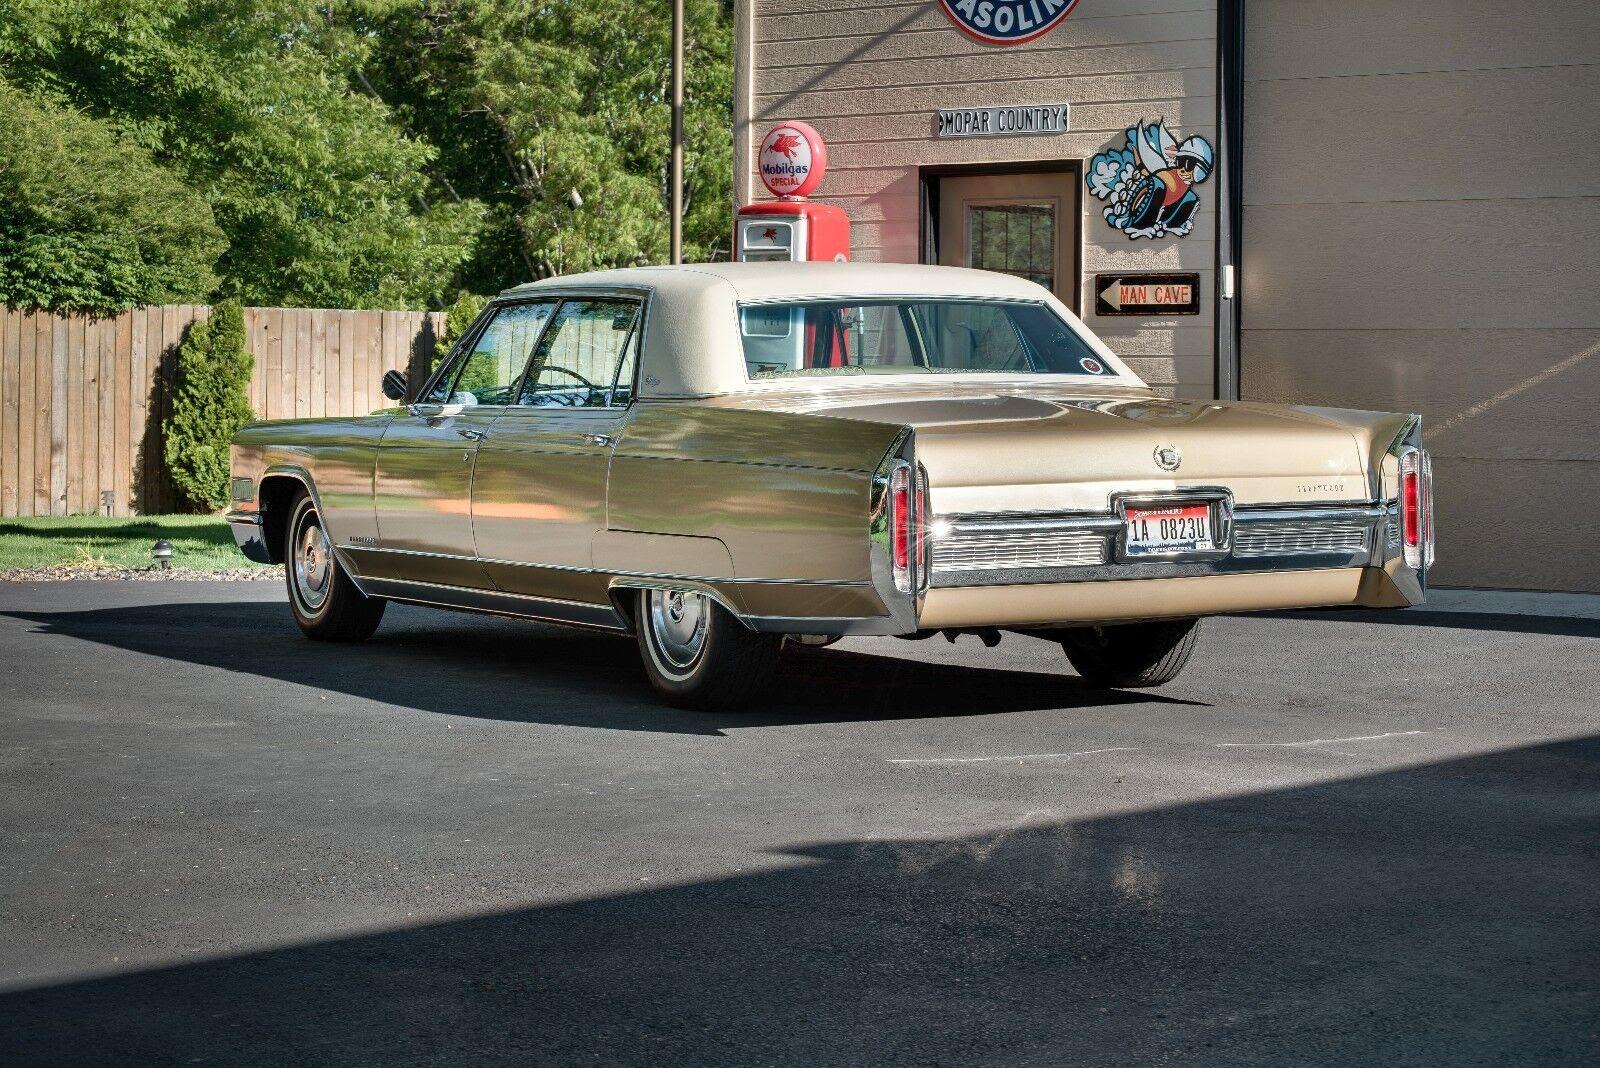 1966 Cadillac Fleetwood Brougham - Original Low Miles